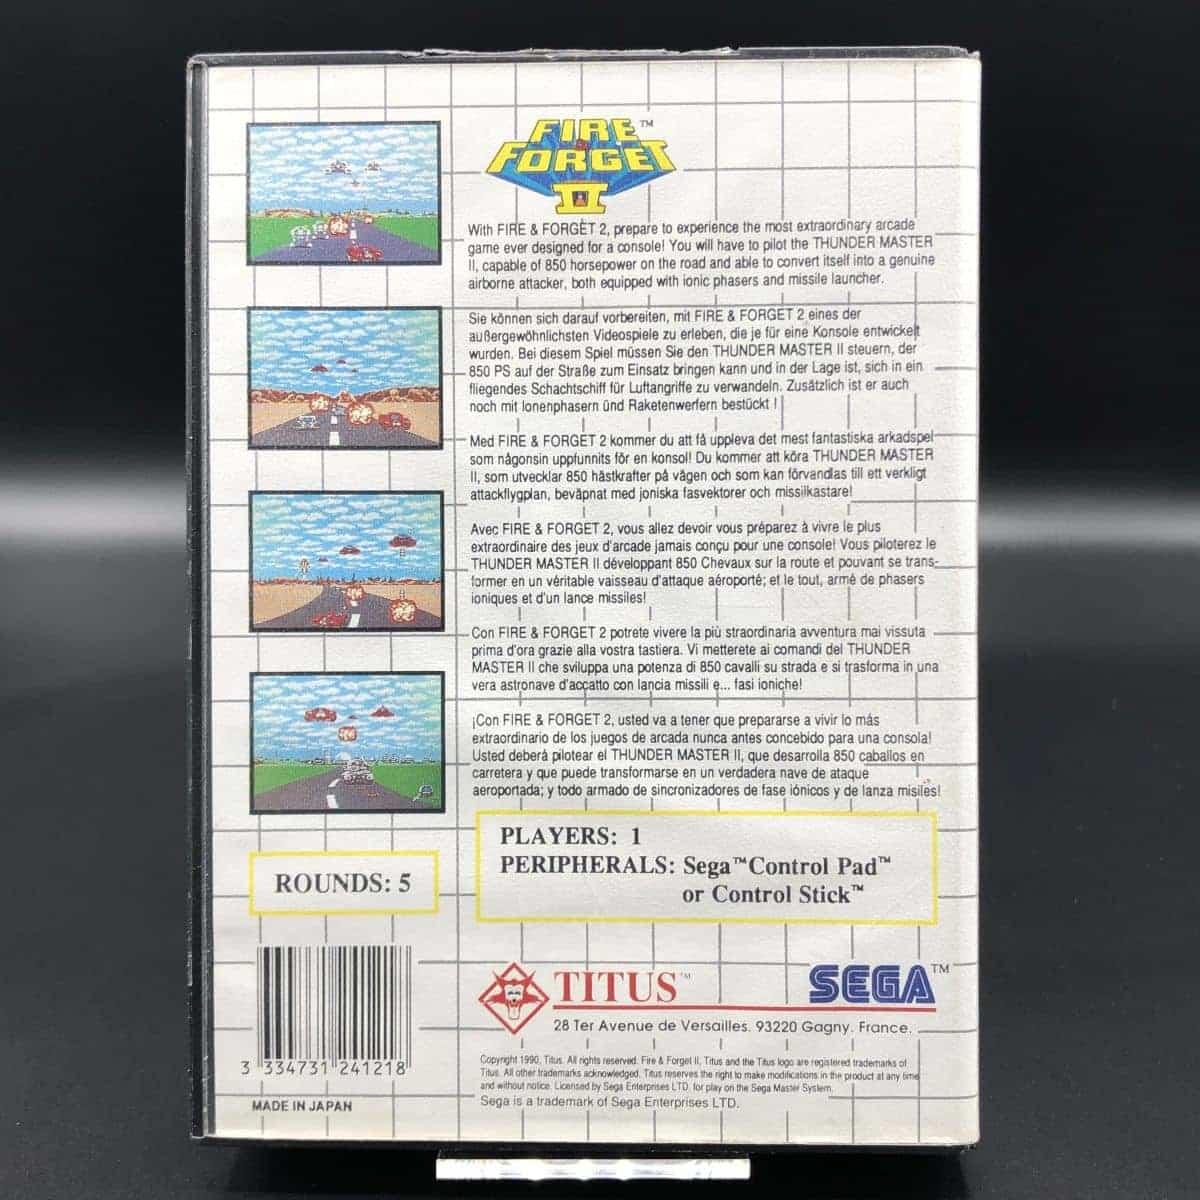 Fire & Forget II (Komplett) (Gut) Sega Master System